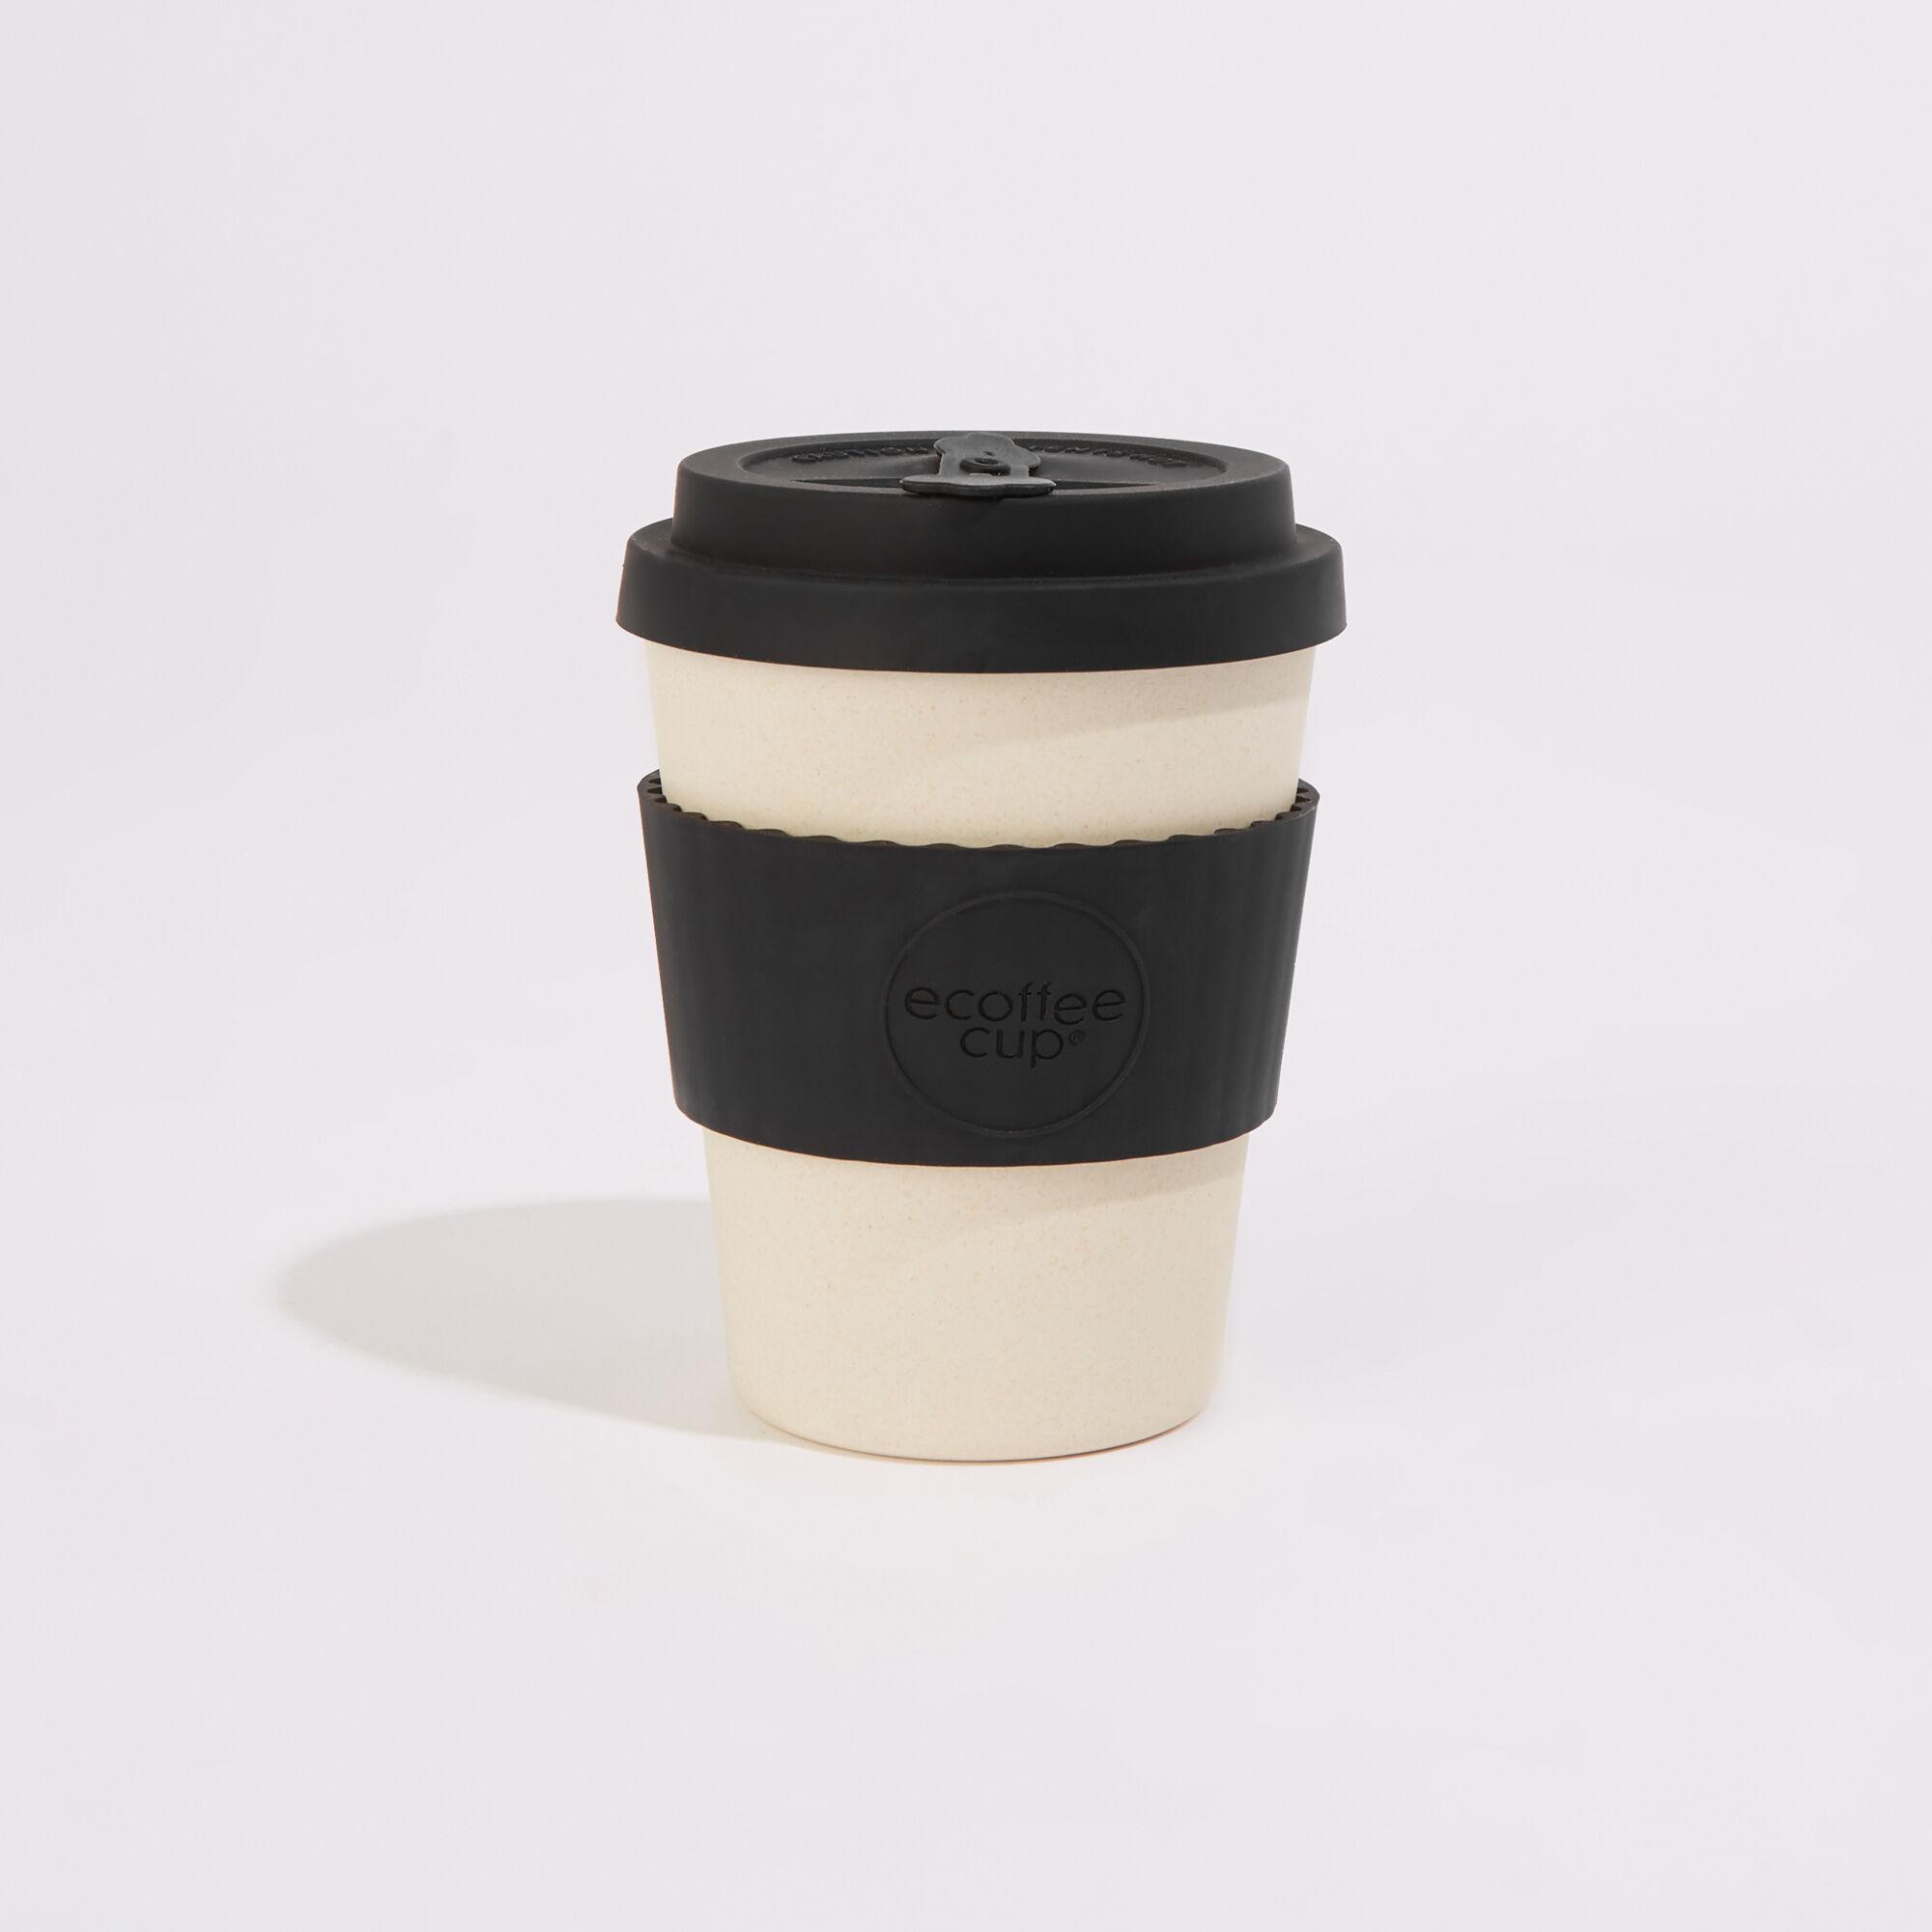 Warehouse, Ecoffee Reusable Coffee Cup White 1